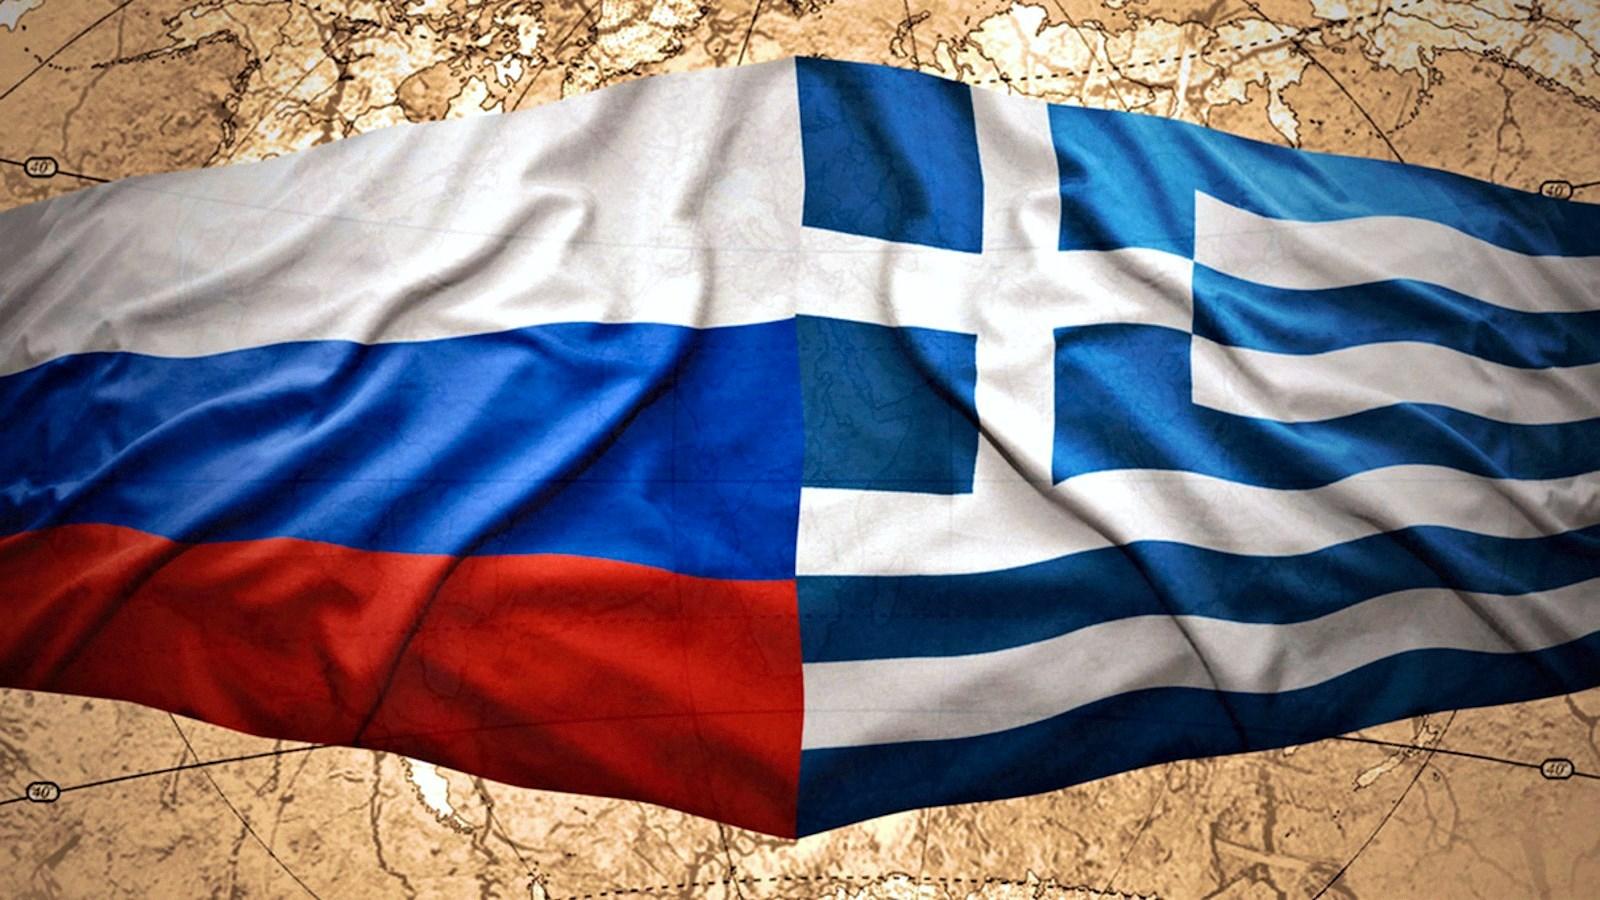 00 russia-greece. 25.04.15